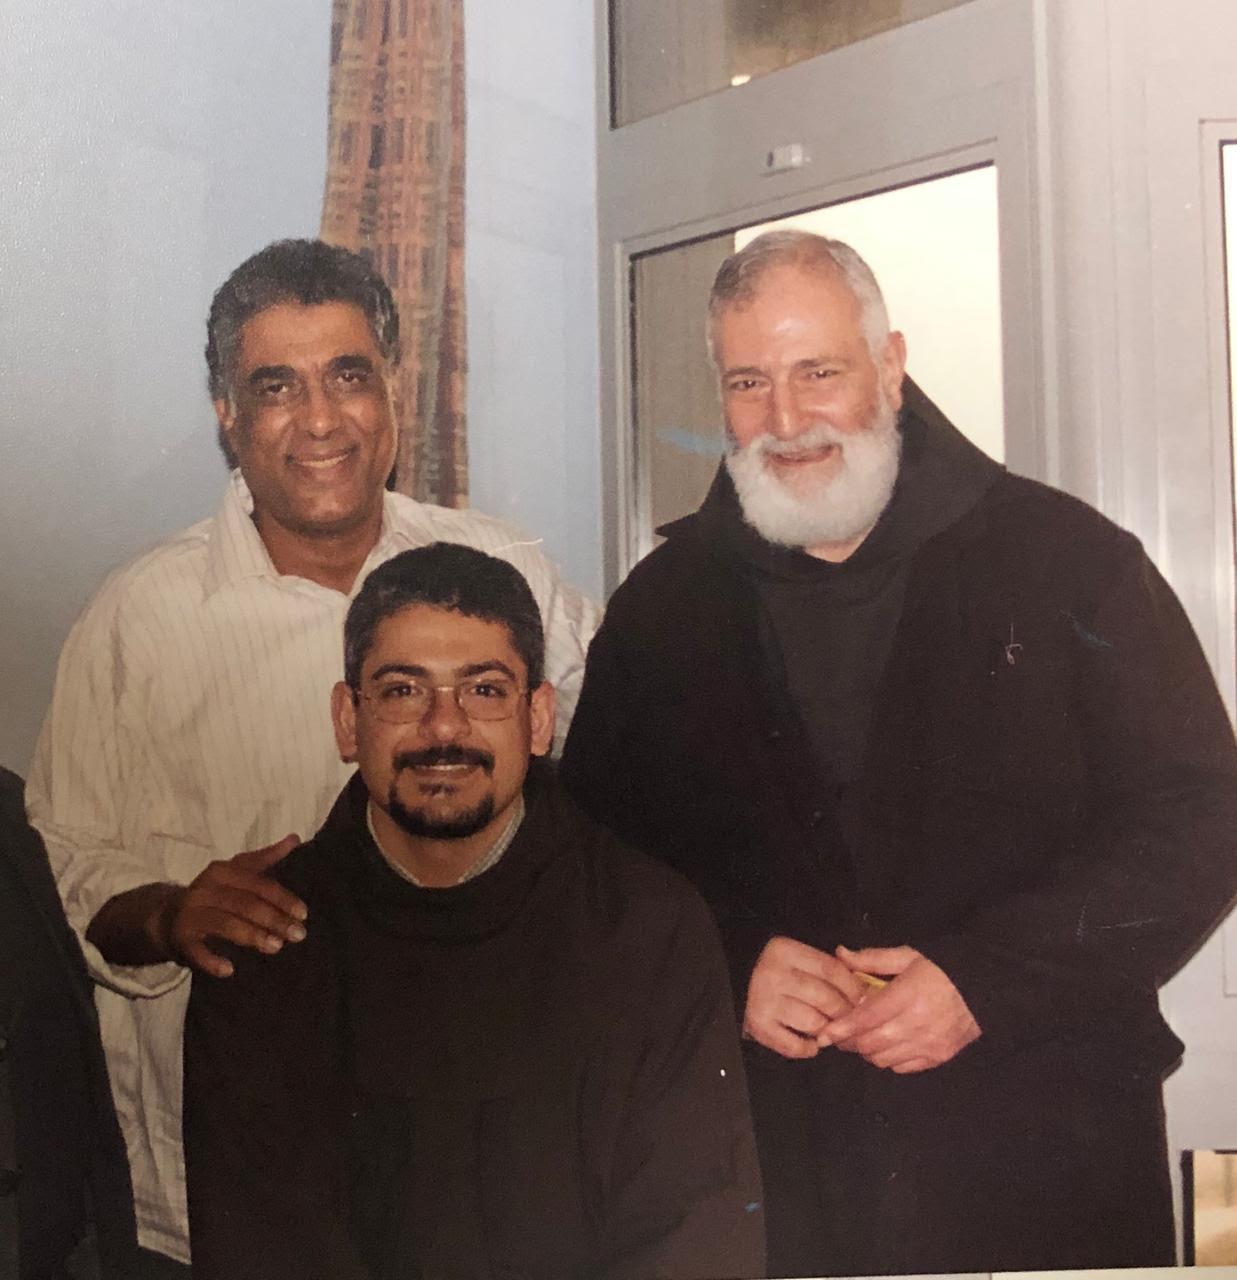 Catholic Cinema Centre: Advocating humanistic values